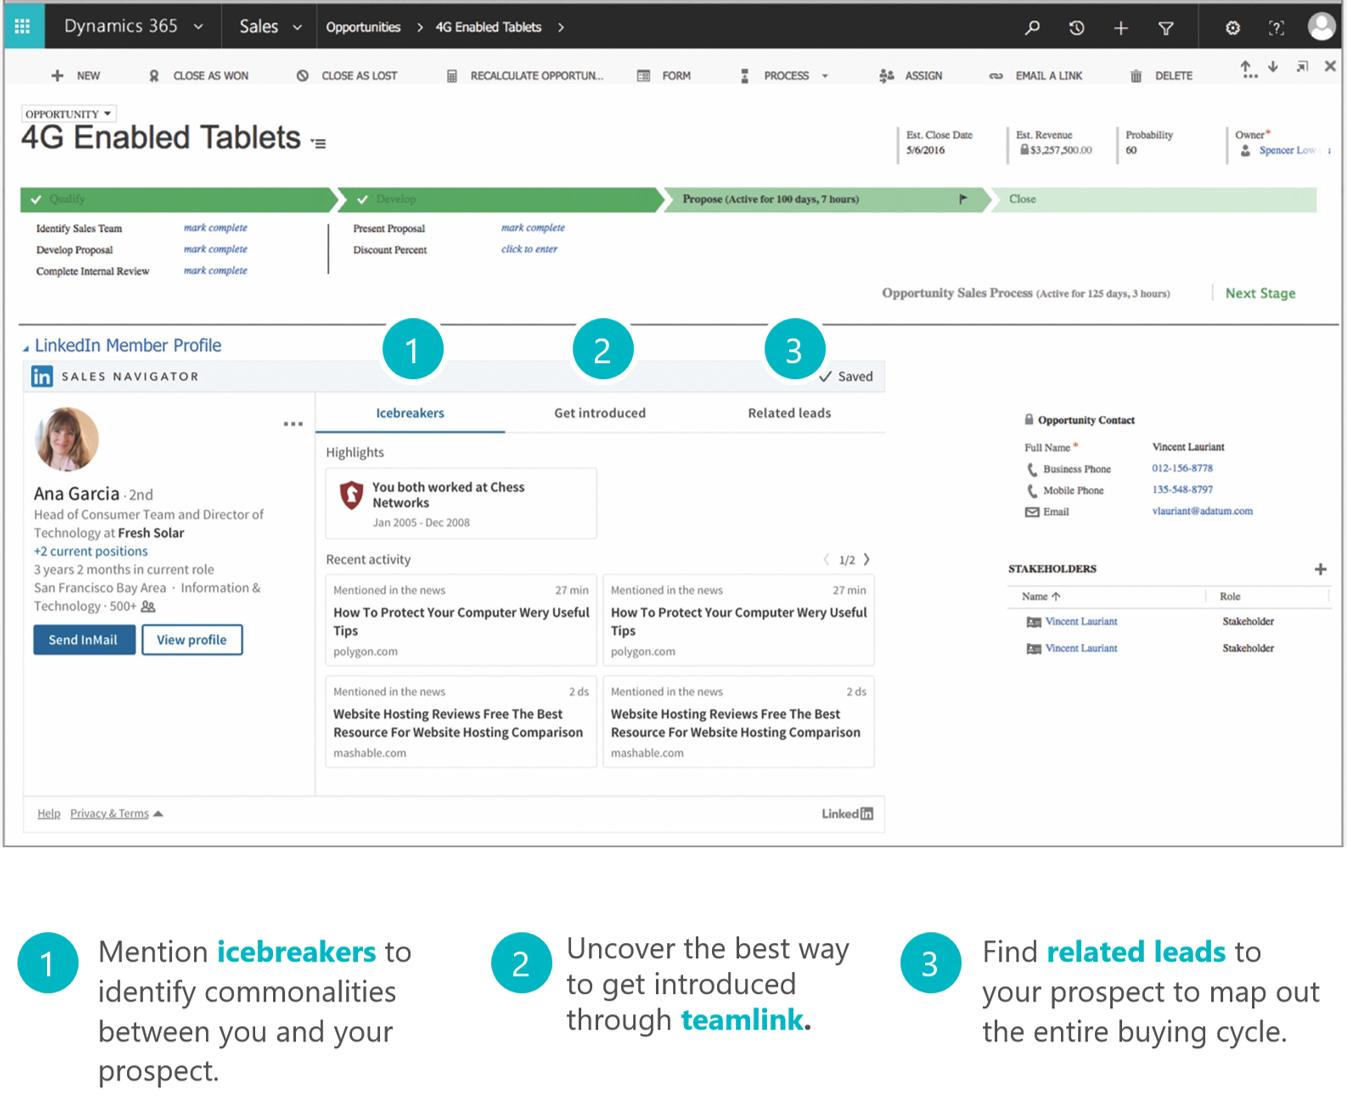 Embedded company info